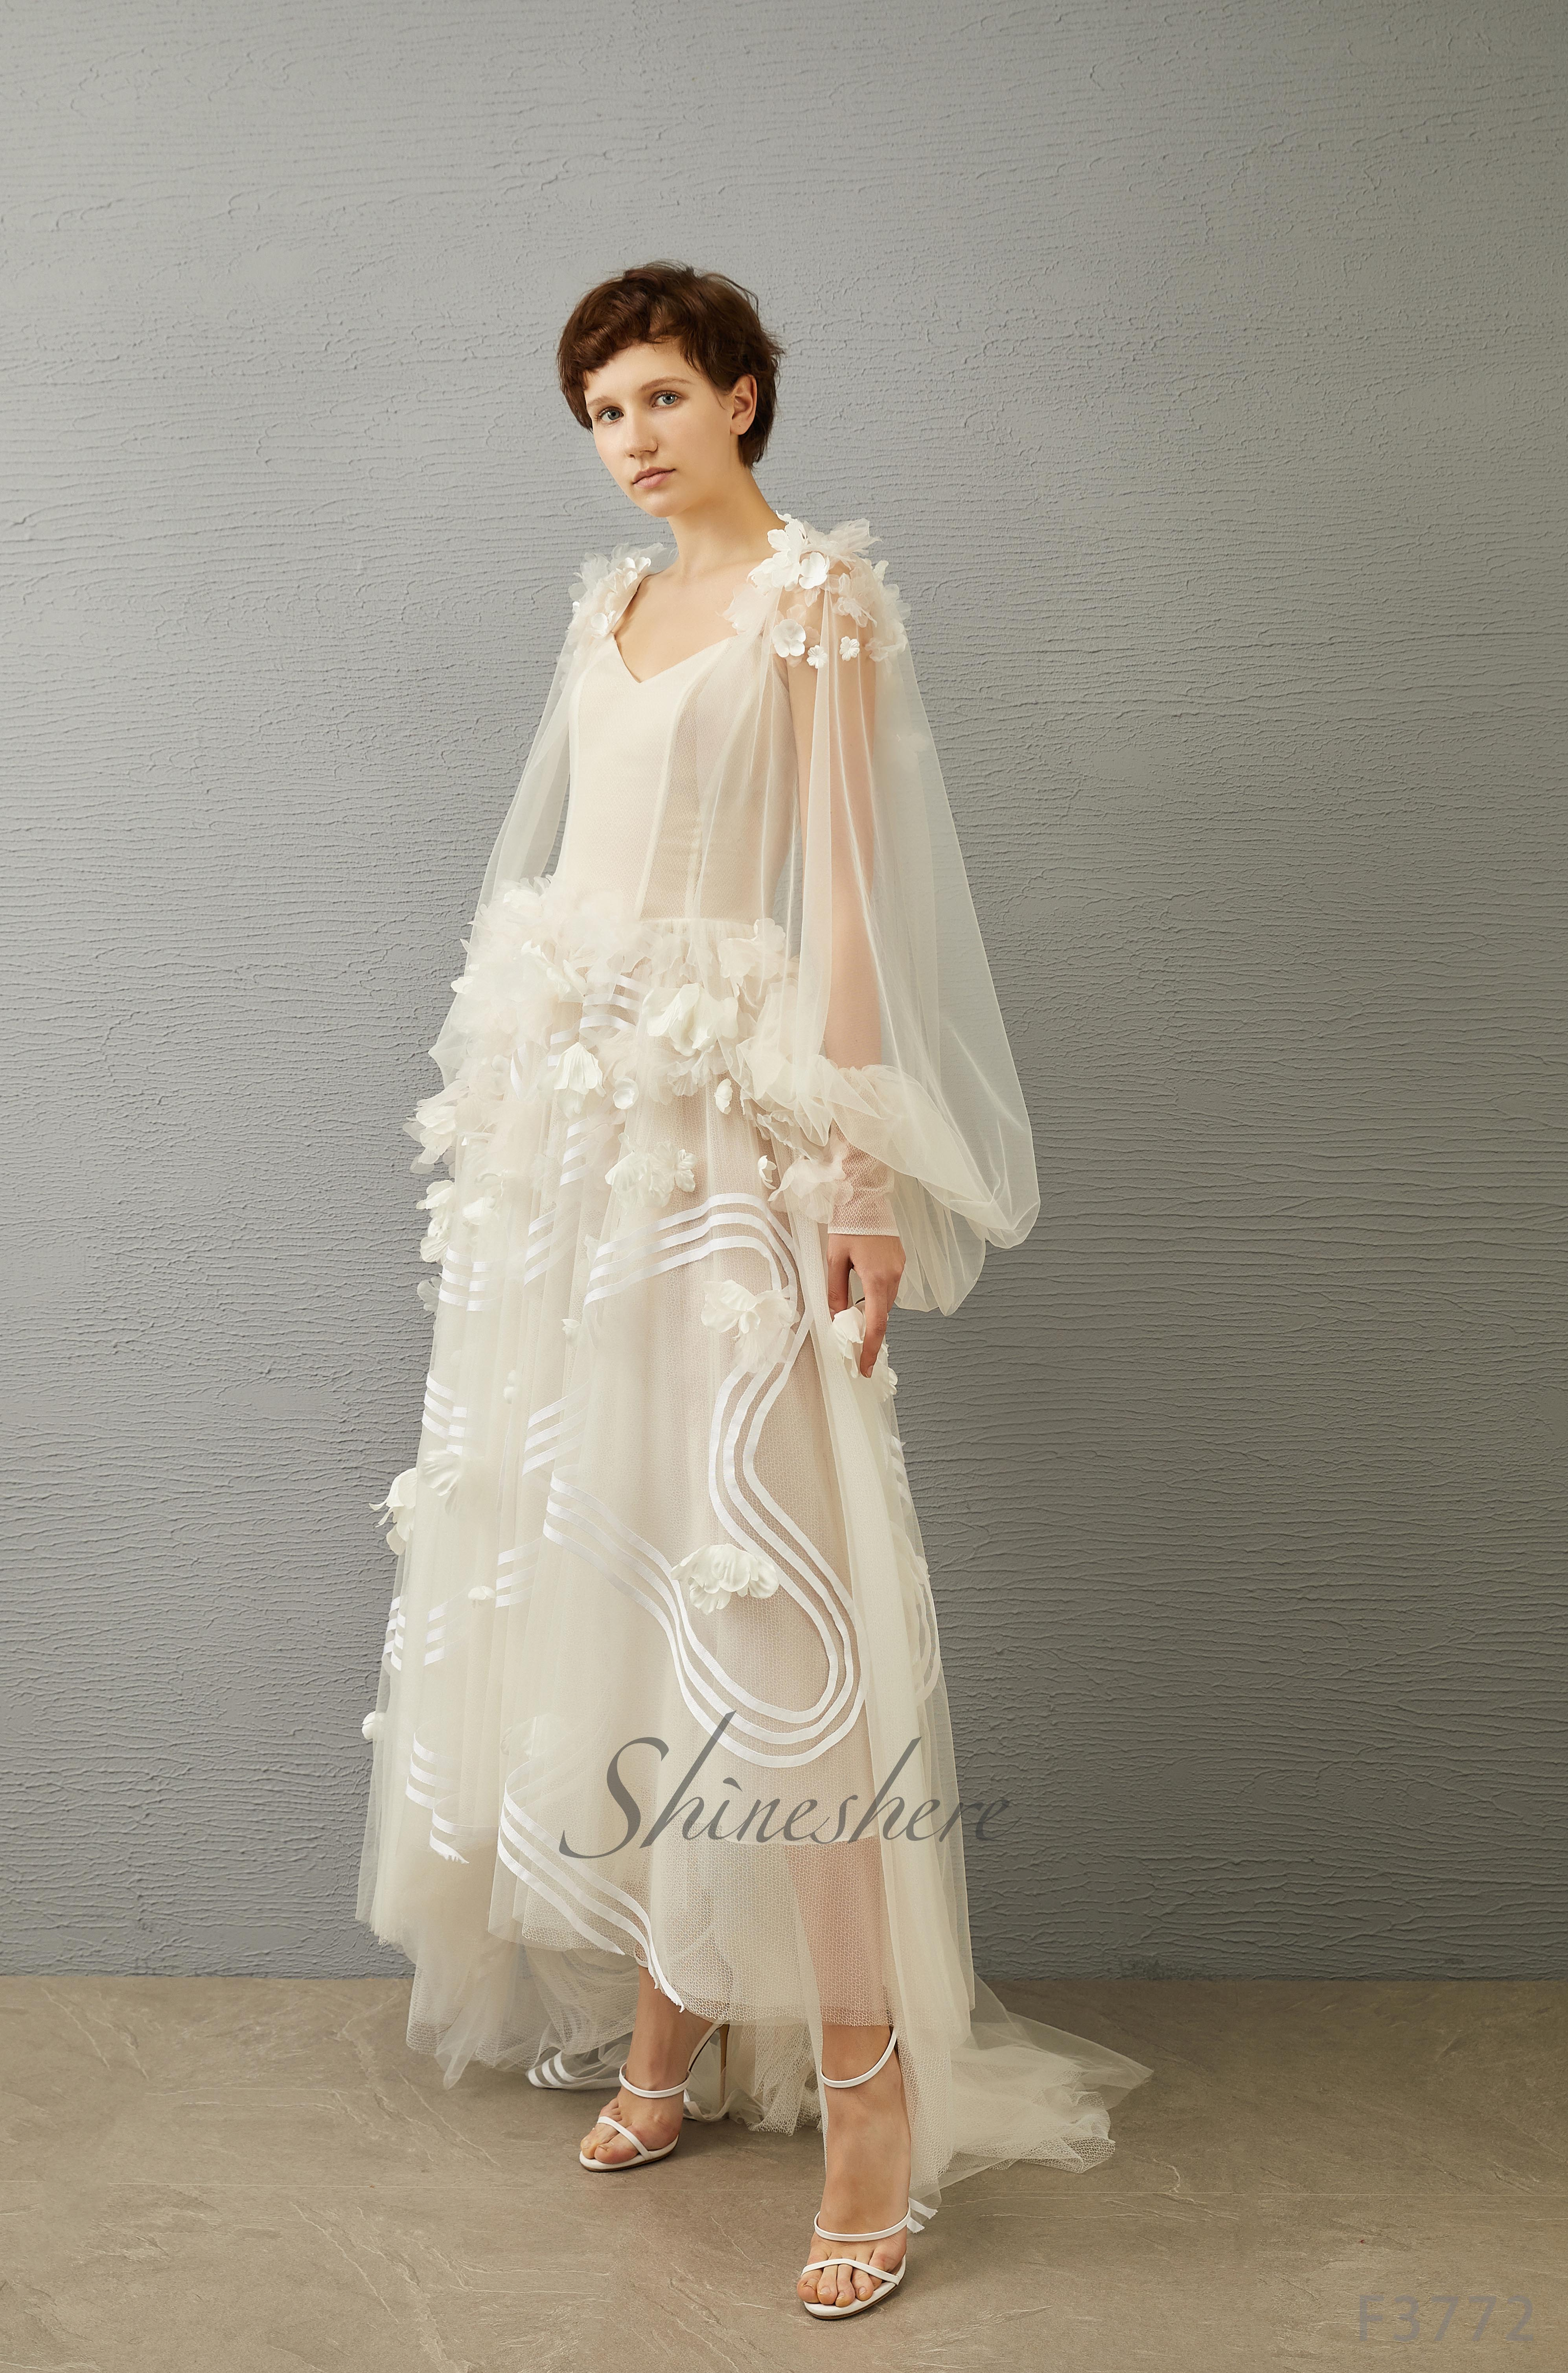 Jusere فستان الزفاف أنيقة منتفخ الأكمام فستان الزفاف مع قطار ألف خط الأزهار بسيطة الخامس الرقبة فستان زفاف